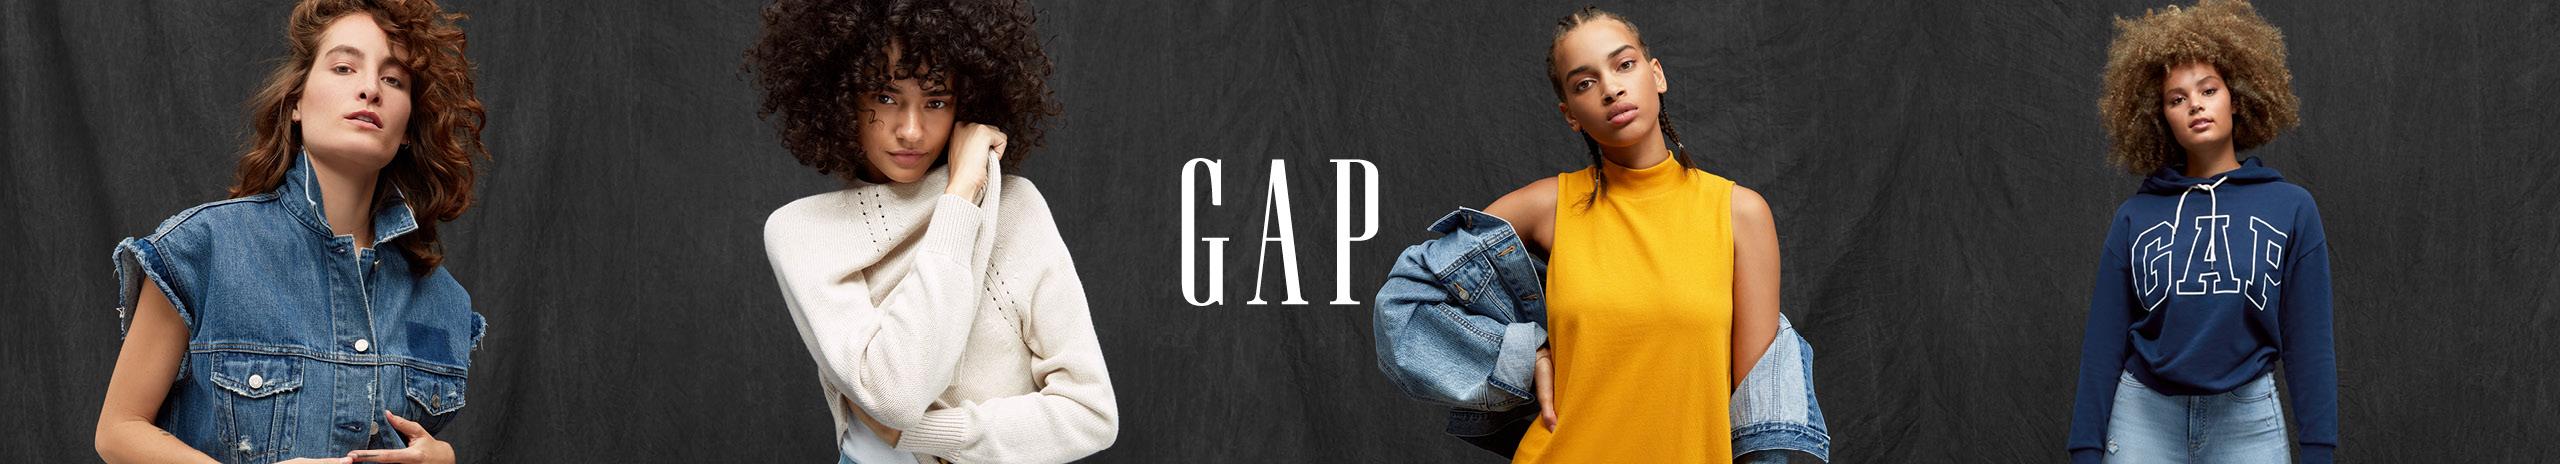 GAP Online Shop | GAP bezpłatna przesyłka